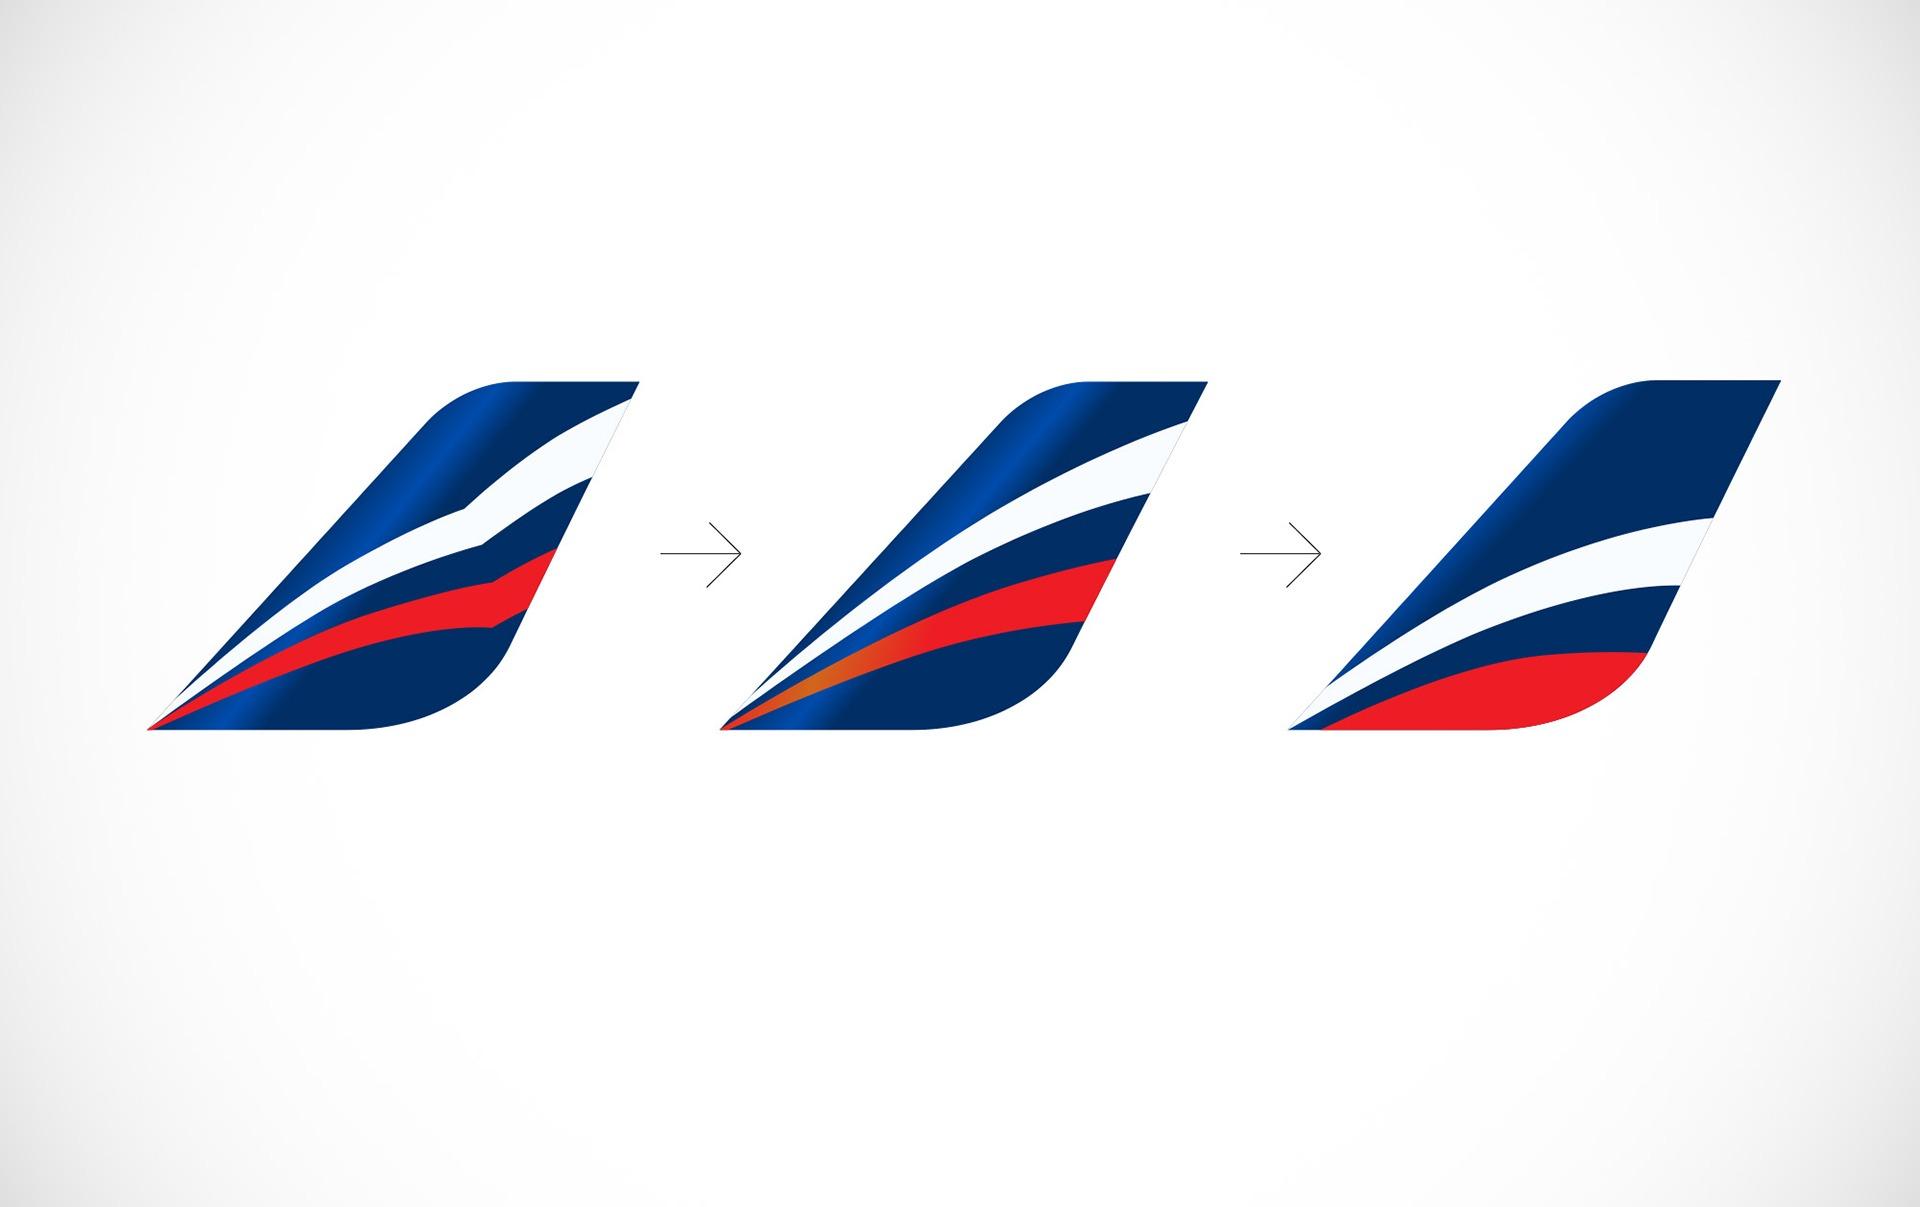 Aeroflot brand identity,, re-branding, ребрендинг авиакомпании, брендинг авиакомпании, Asgard Branding, лого Аэрофлот, logo